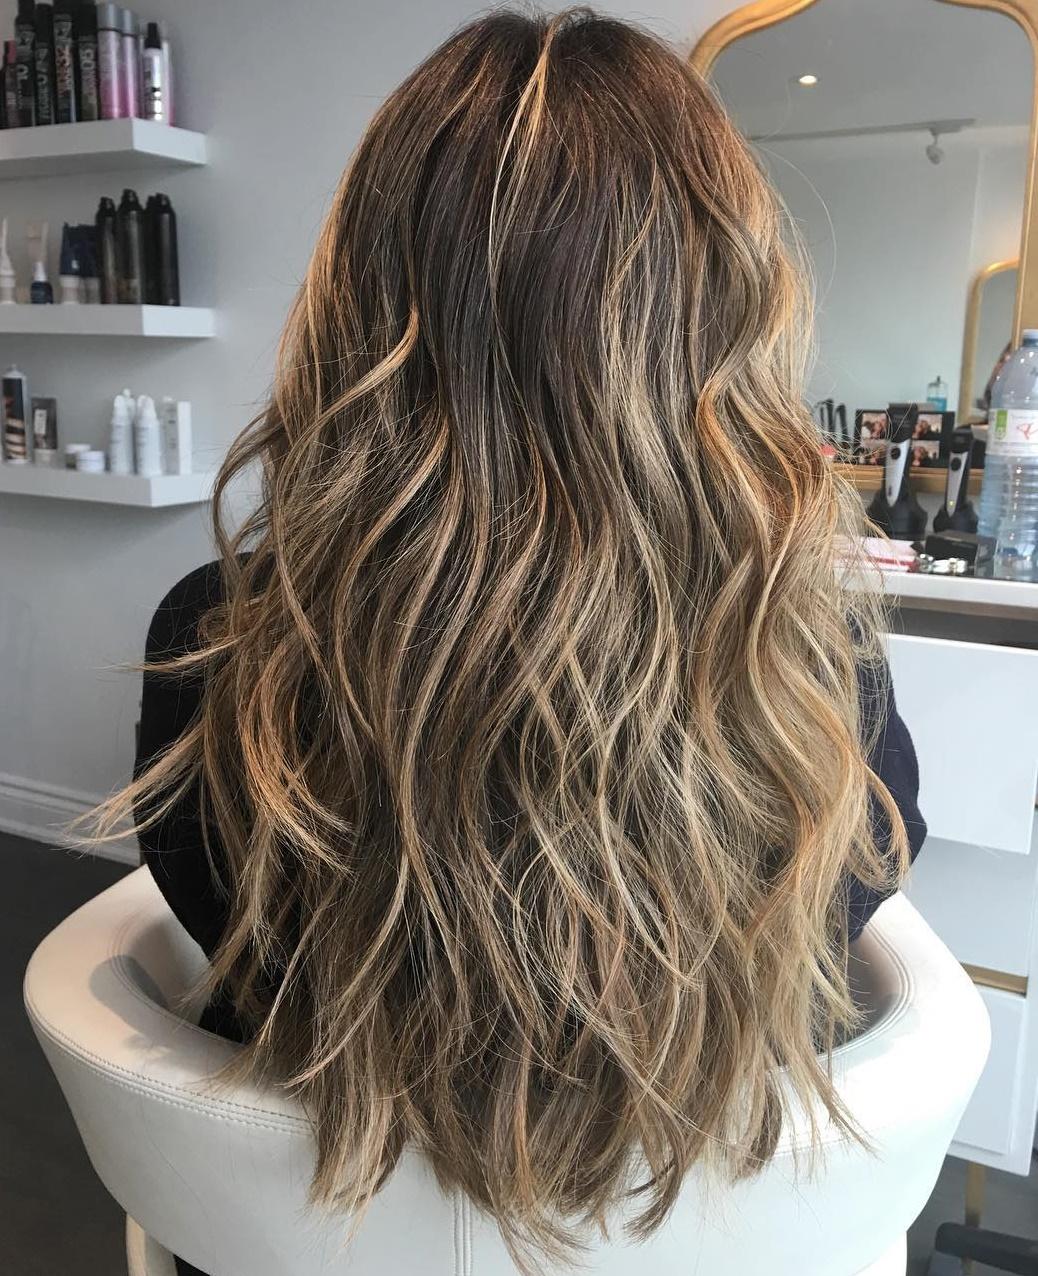 Low-Maintenance Beach Waves Long Hair